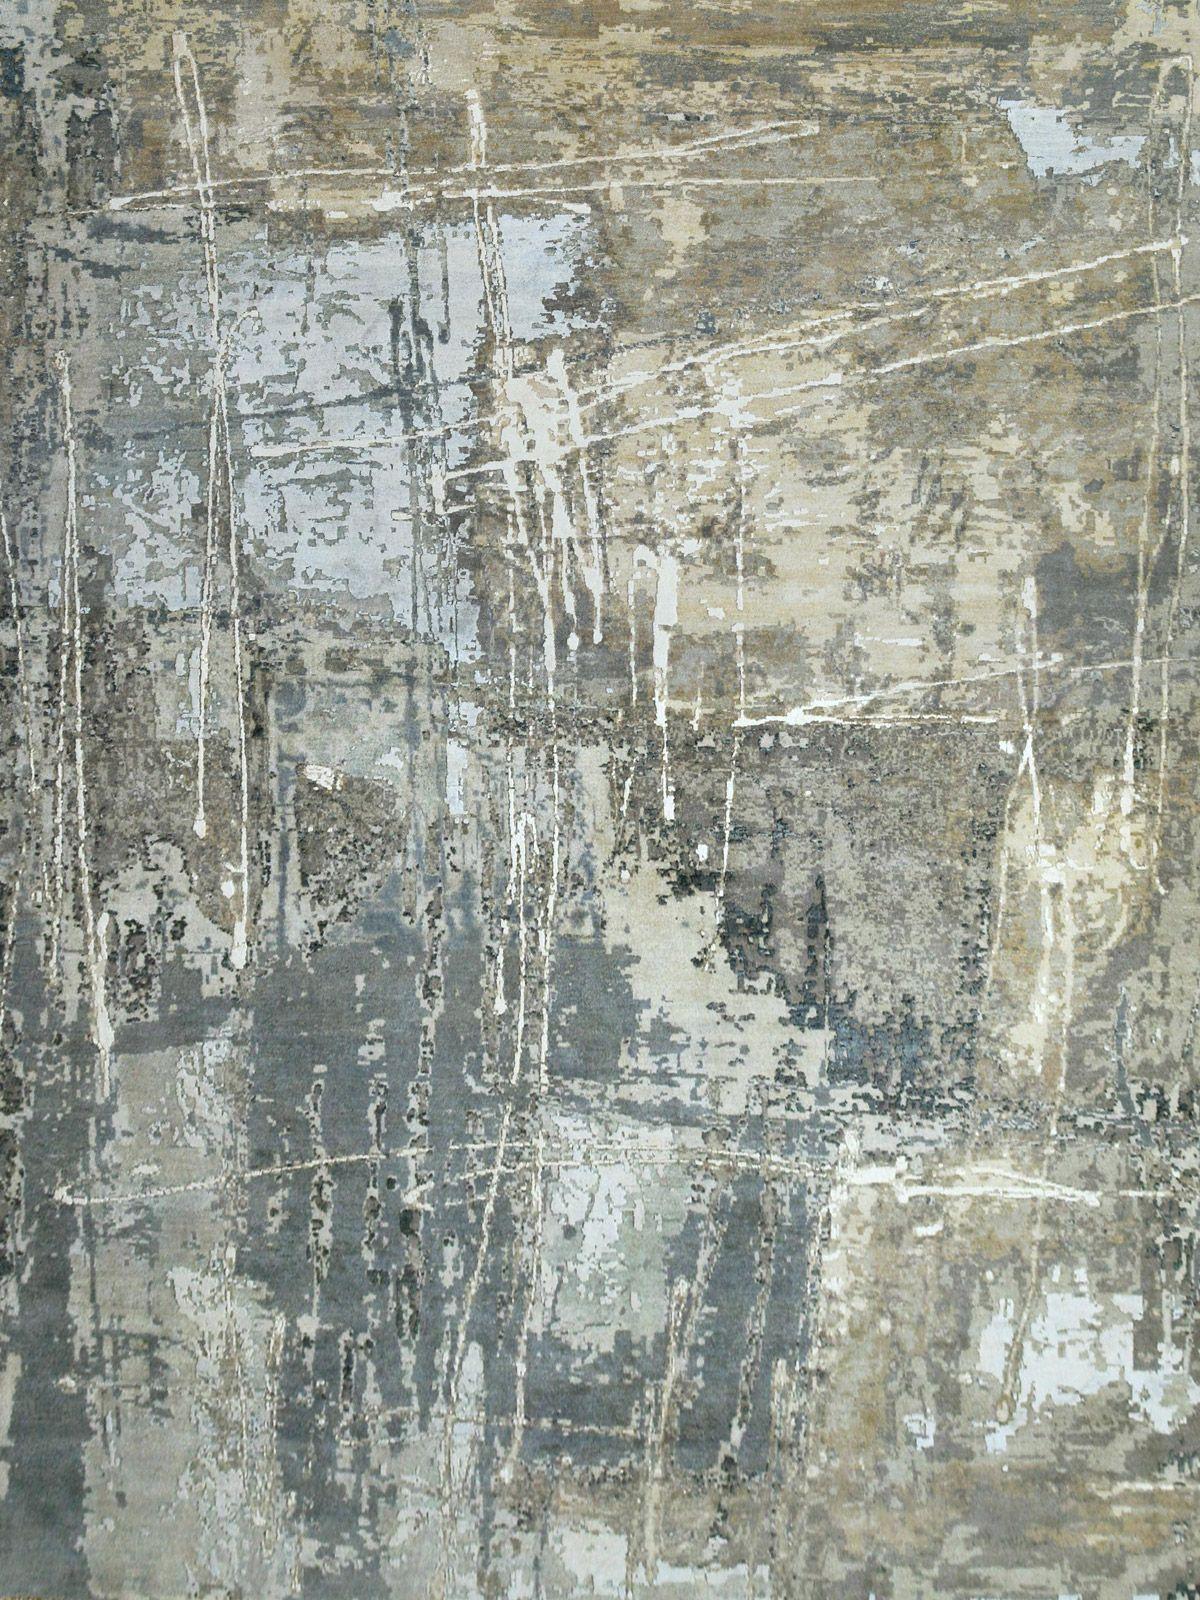 Luxury Rugs Bespoke Designer Rugs Bazaar Velvet London Rug Texture Abstract Modern Abstract Painting